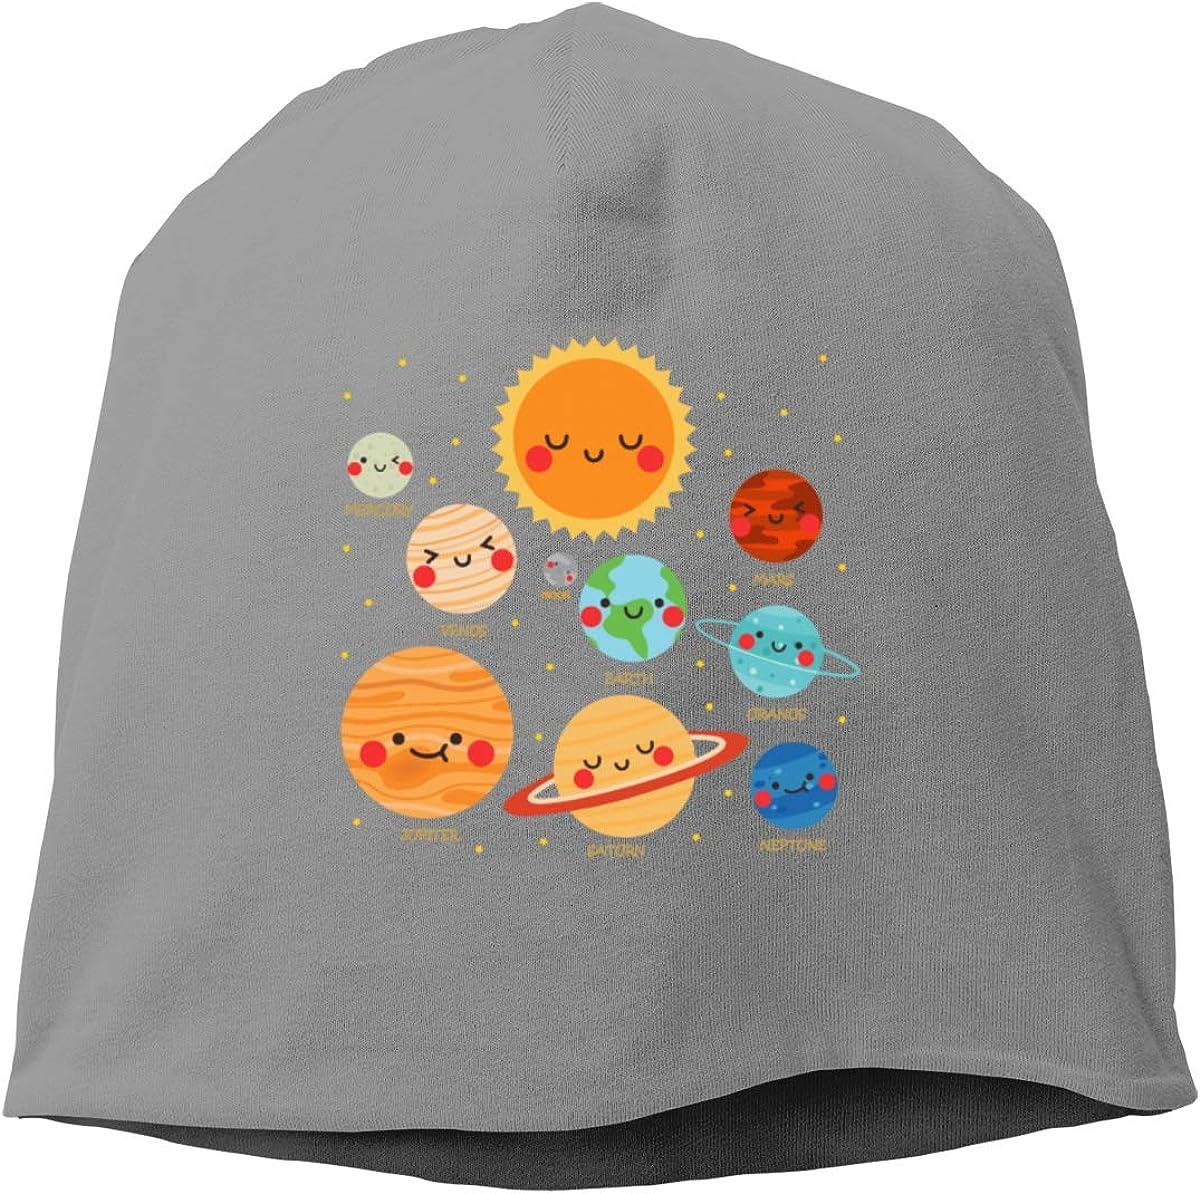 Negi Kids Solar System Beanie Caps Beanie Hats for Unisex